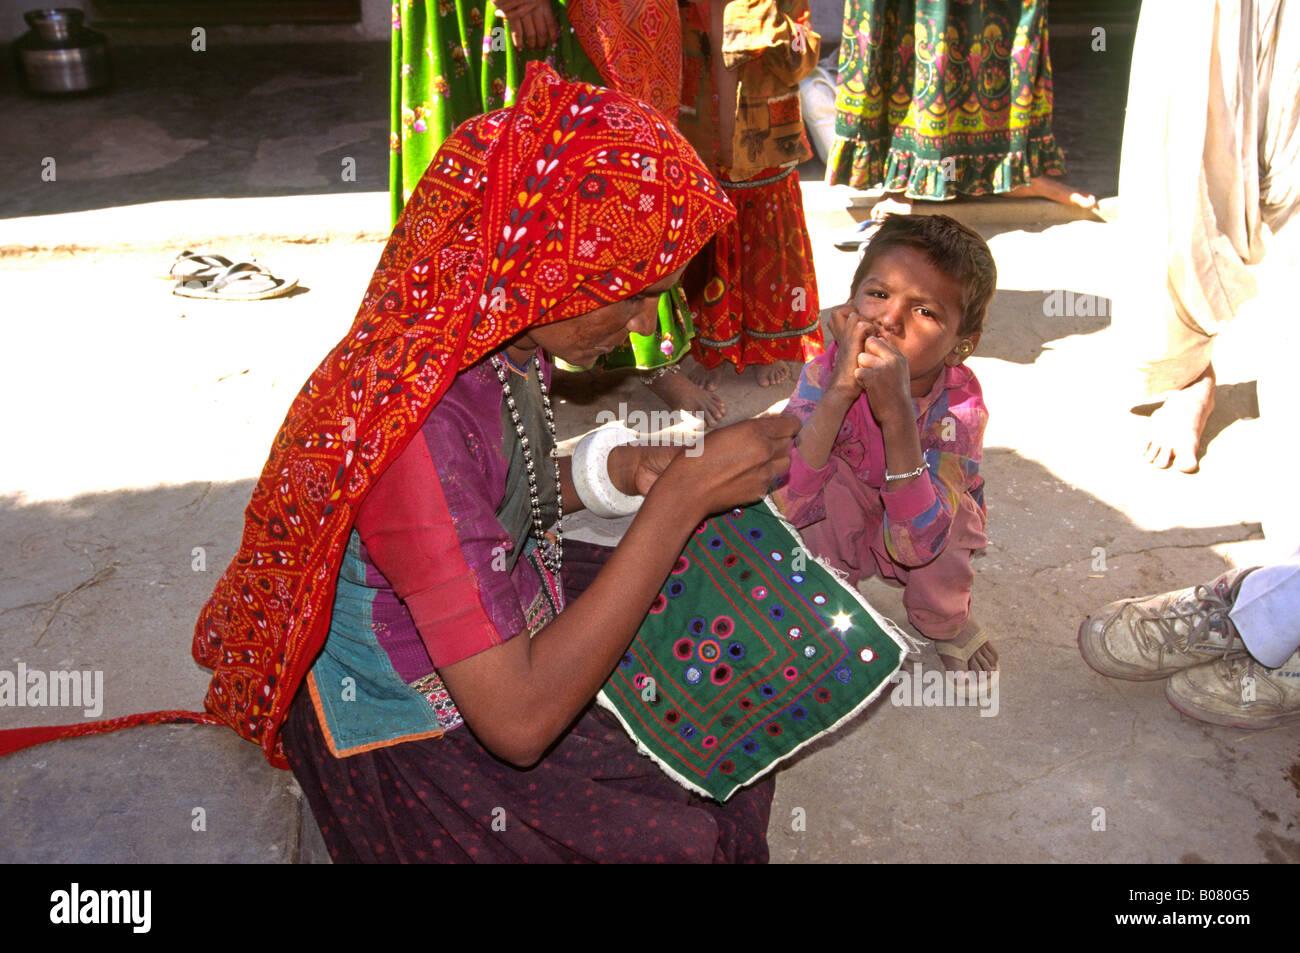 India Gujerat Rann of Kutch crafts Satapar Village Ahir woman sewing shisha mirror work cushion cover - Stock Image